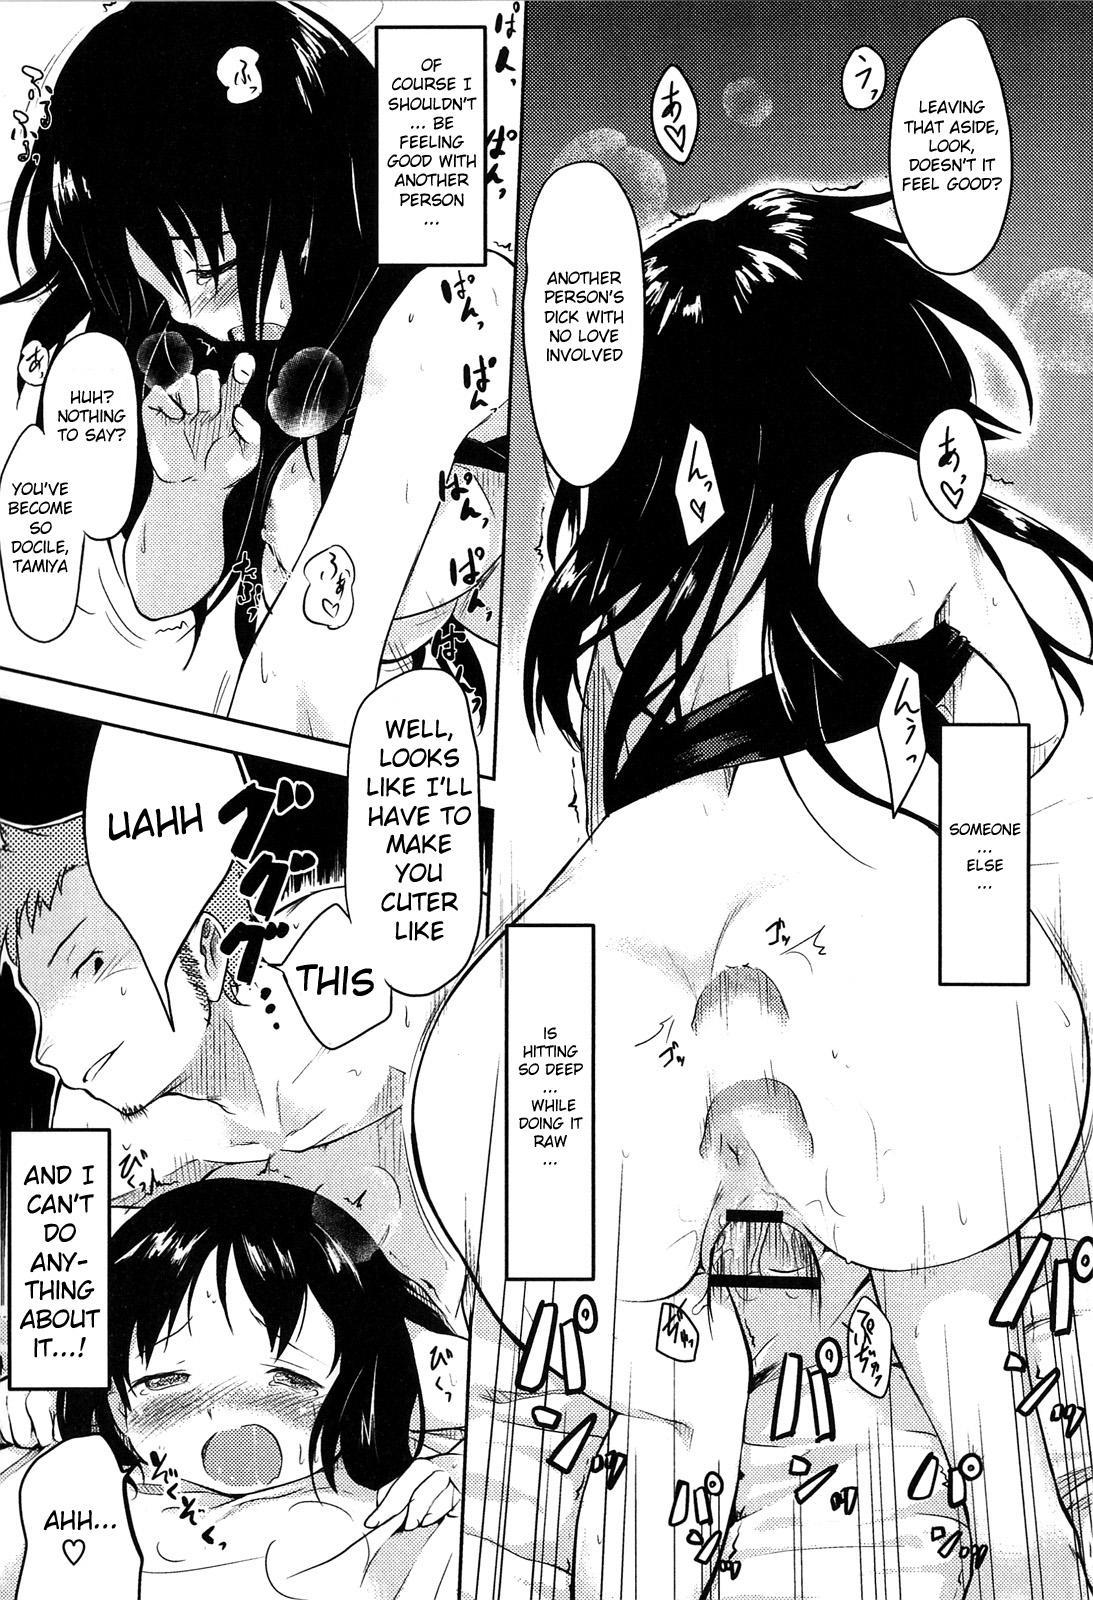 [Higenamuchi] Hito Kano - Tanin Kanojo Ch. 2-3   Someone Else's Girlfriend + After [English] [sureok1] 14